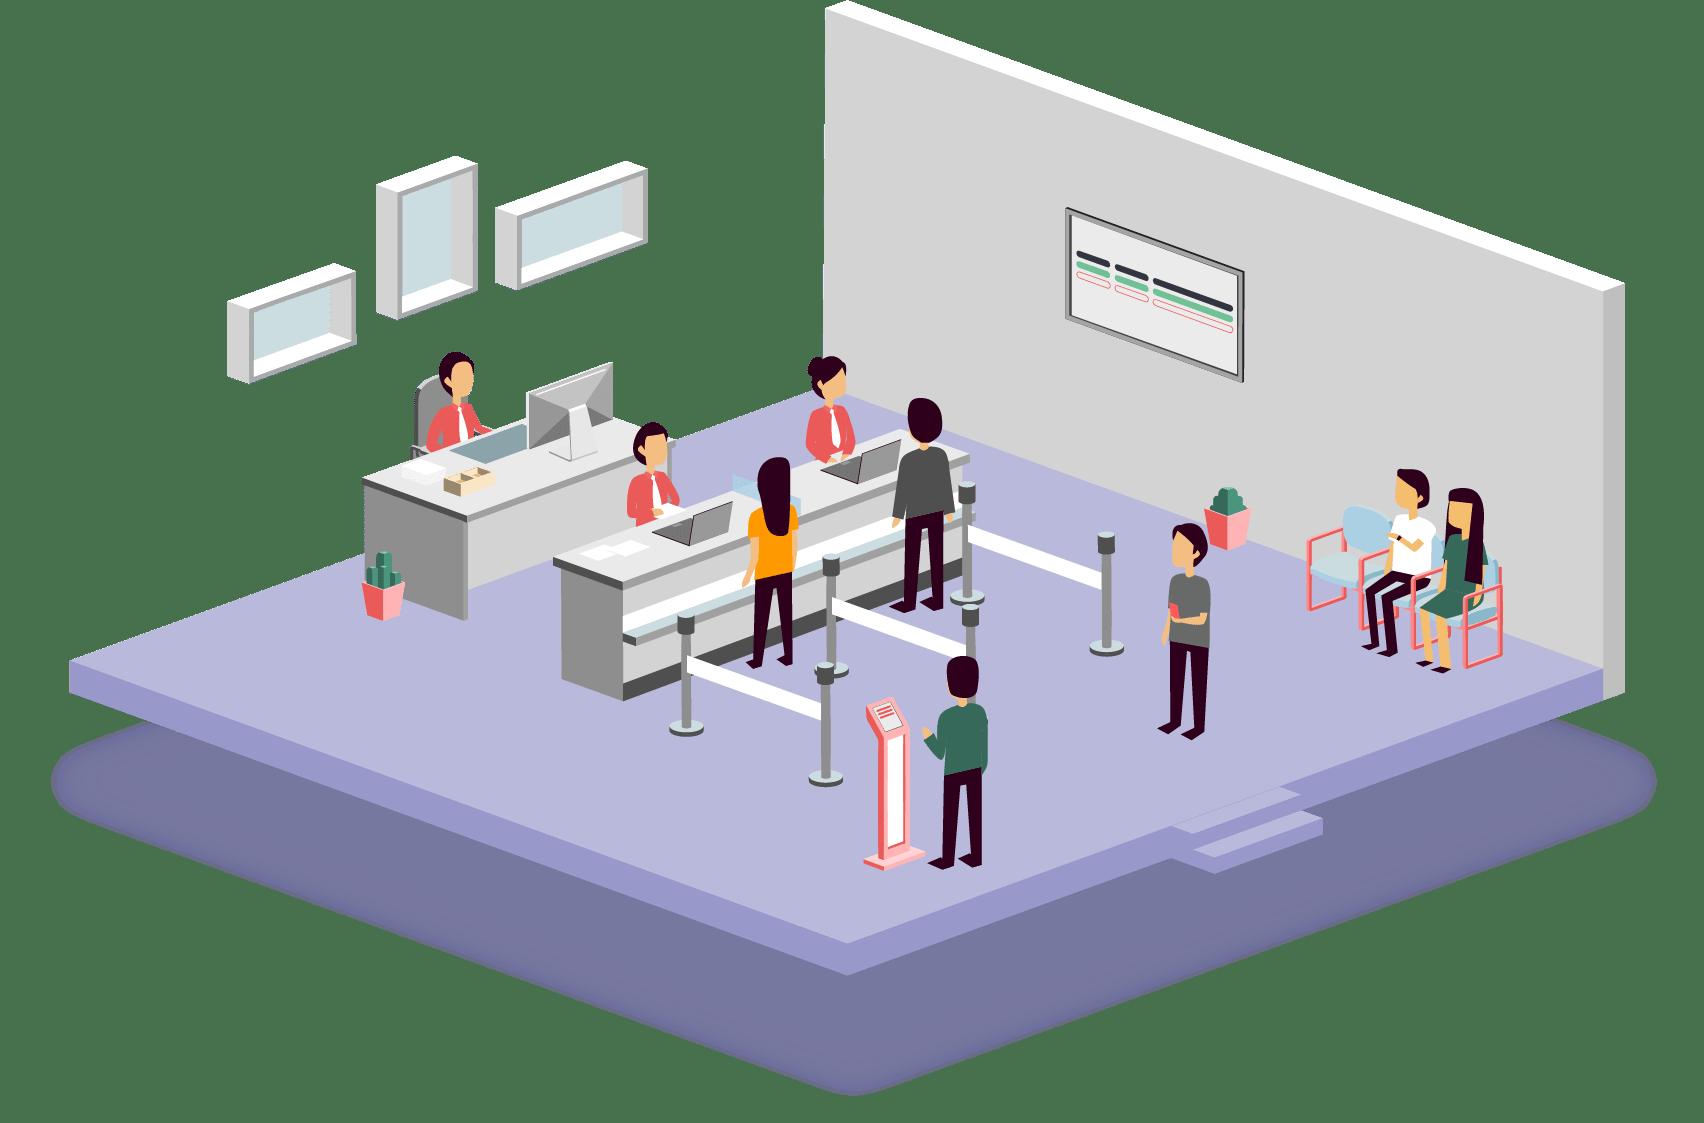 Skiplino: Queue Management System - Smart Queue Management